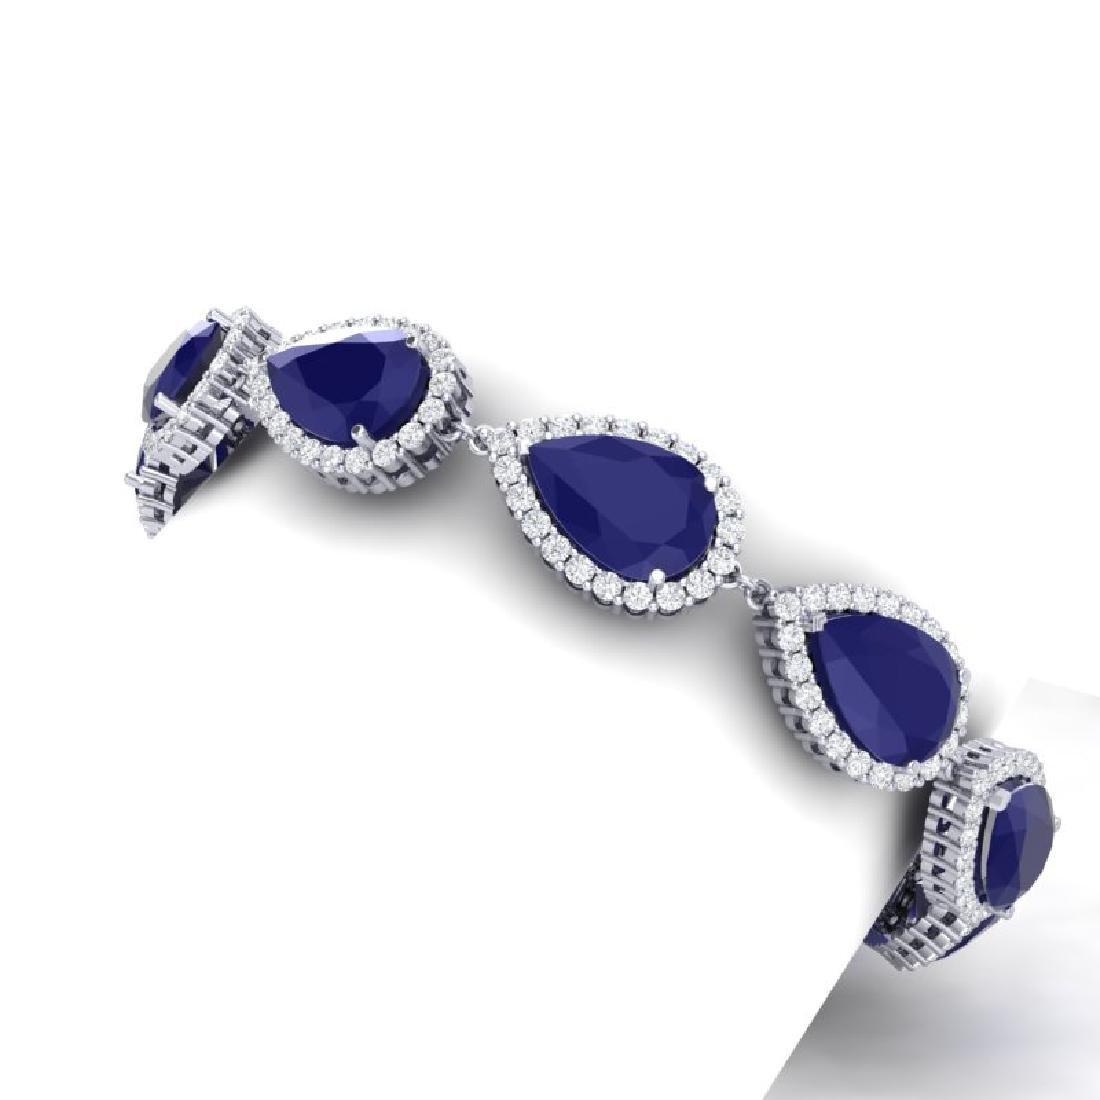 42 CTW Royalty Sapphire & VS Diamond Bracelet 18K White - 2